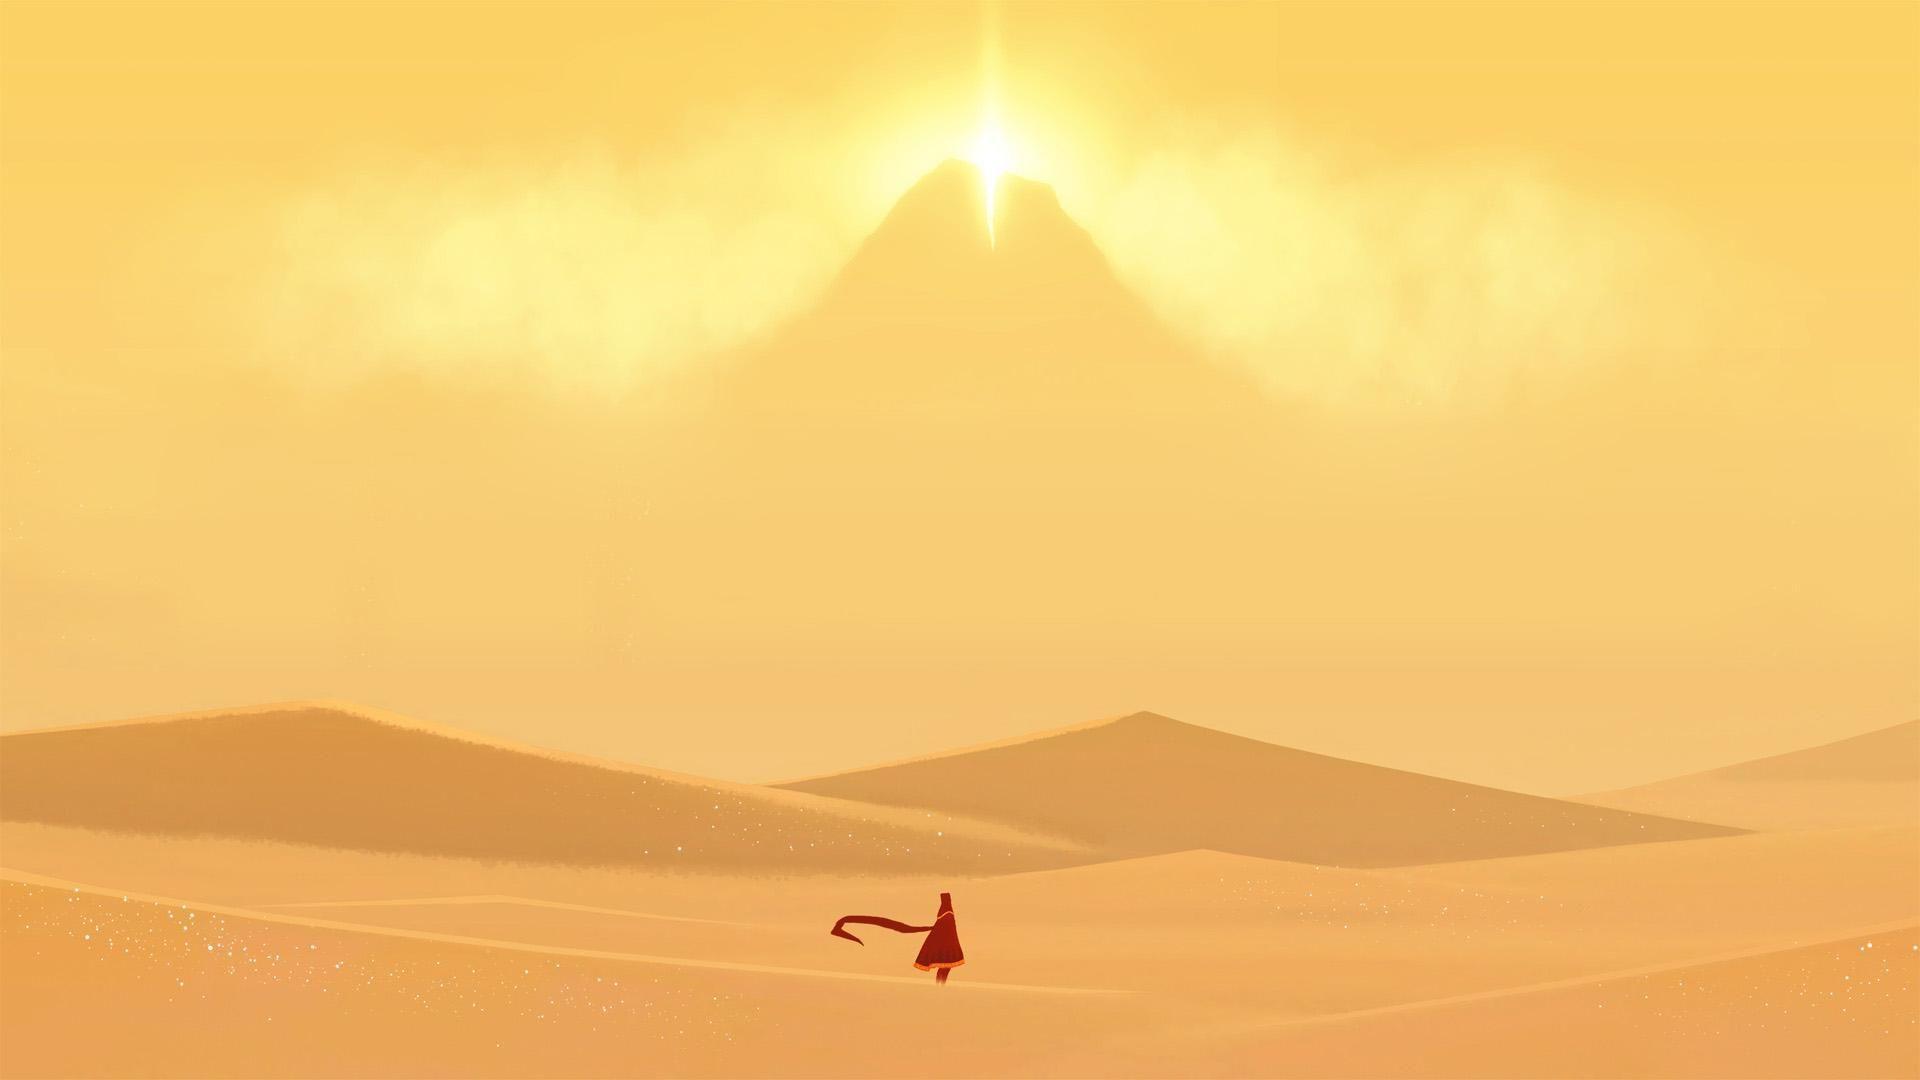 journey-best-ps4-games-10